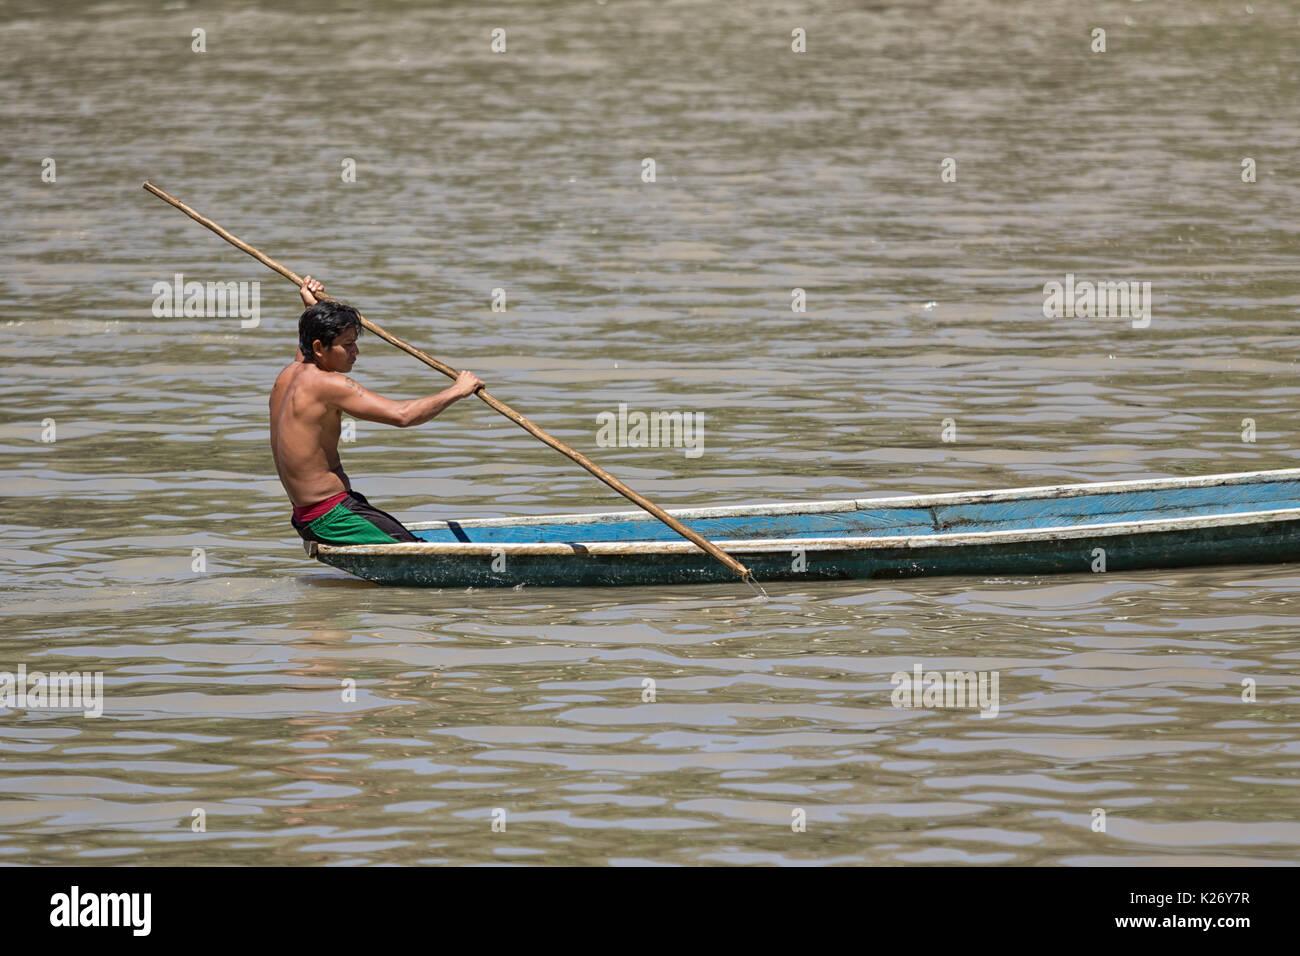 June 6, 2017 Misahualli, Ecuador:  indigenous man in canoe on the Napo river in the Amazon area - Stock Image